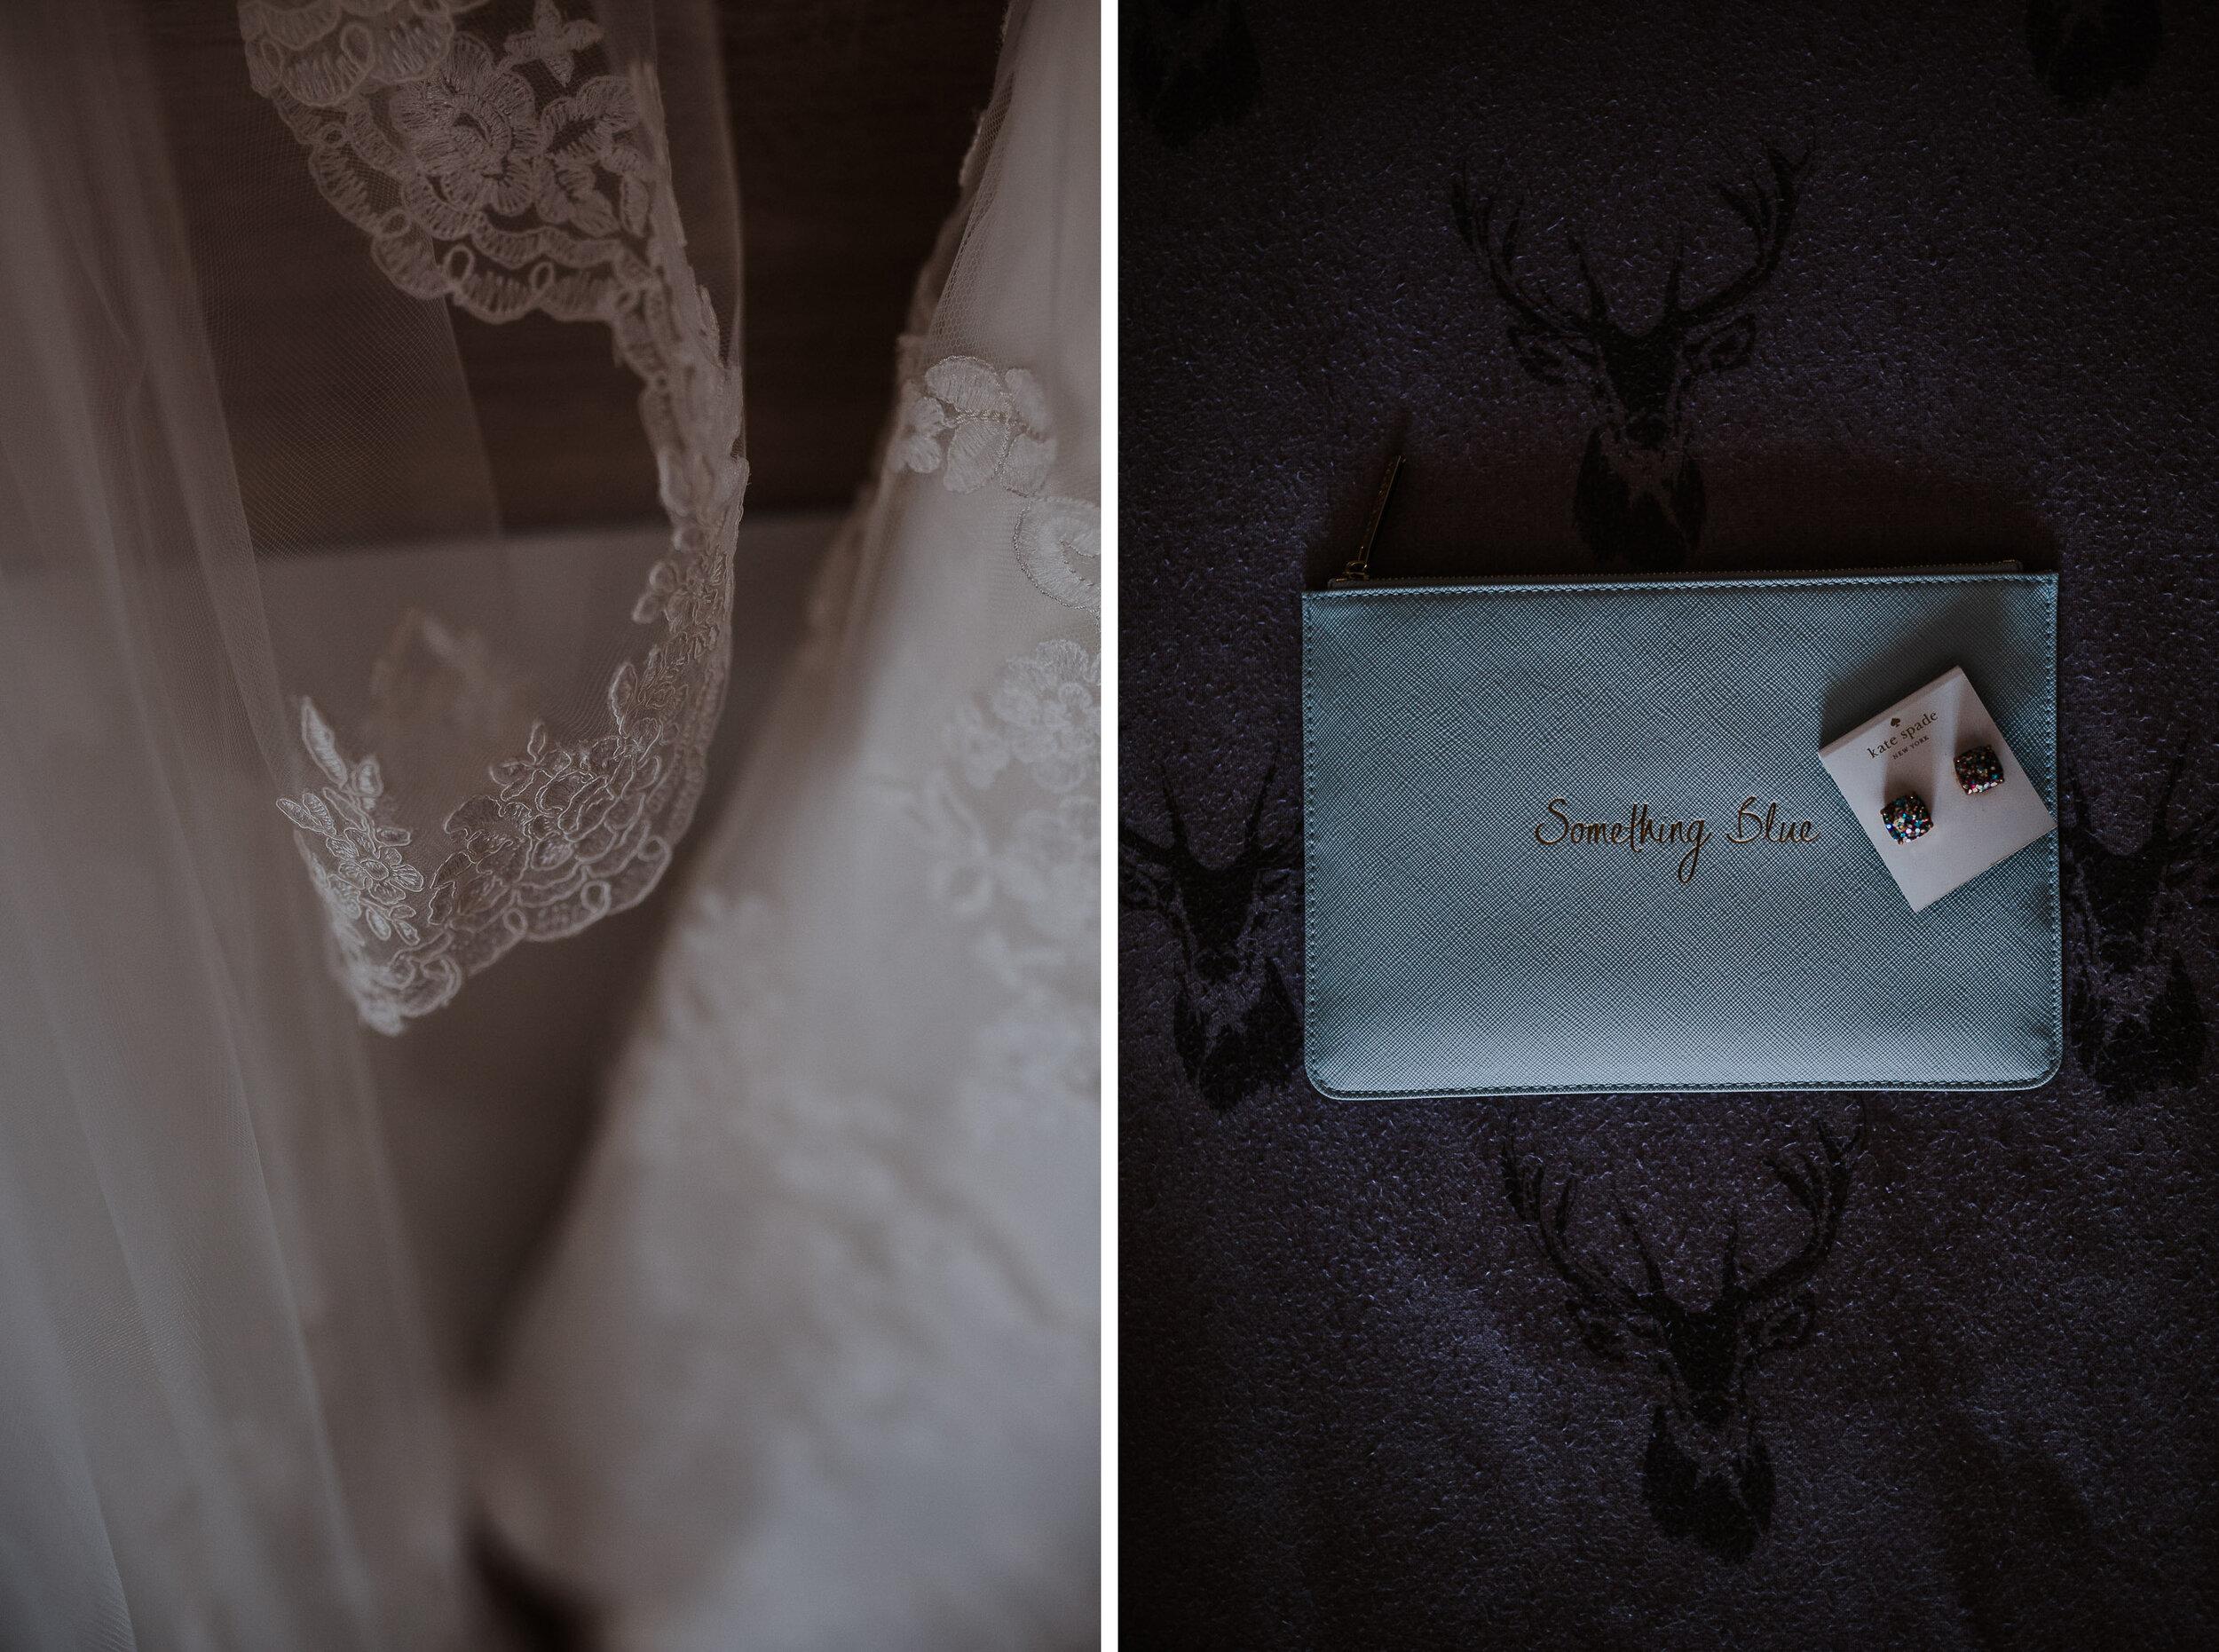 Norfolk_Alternative_Wedding_Photographer-14 copy.jpg